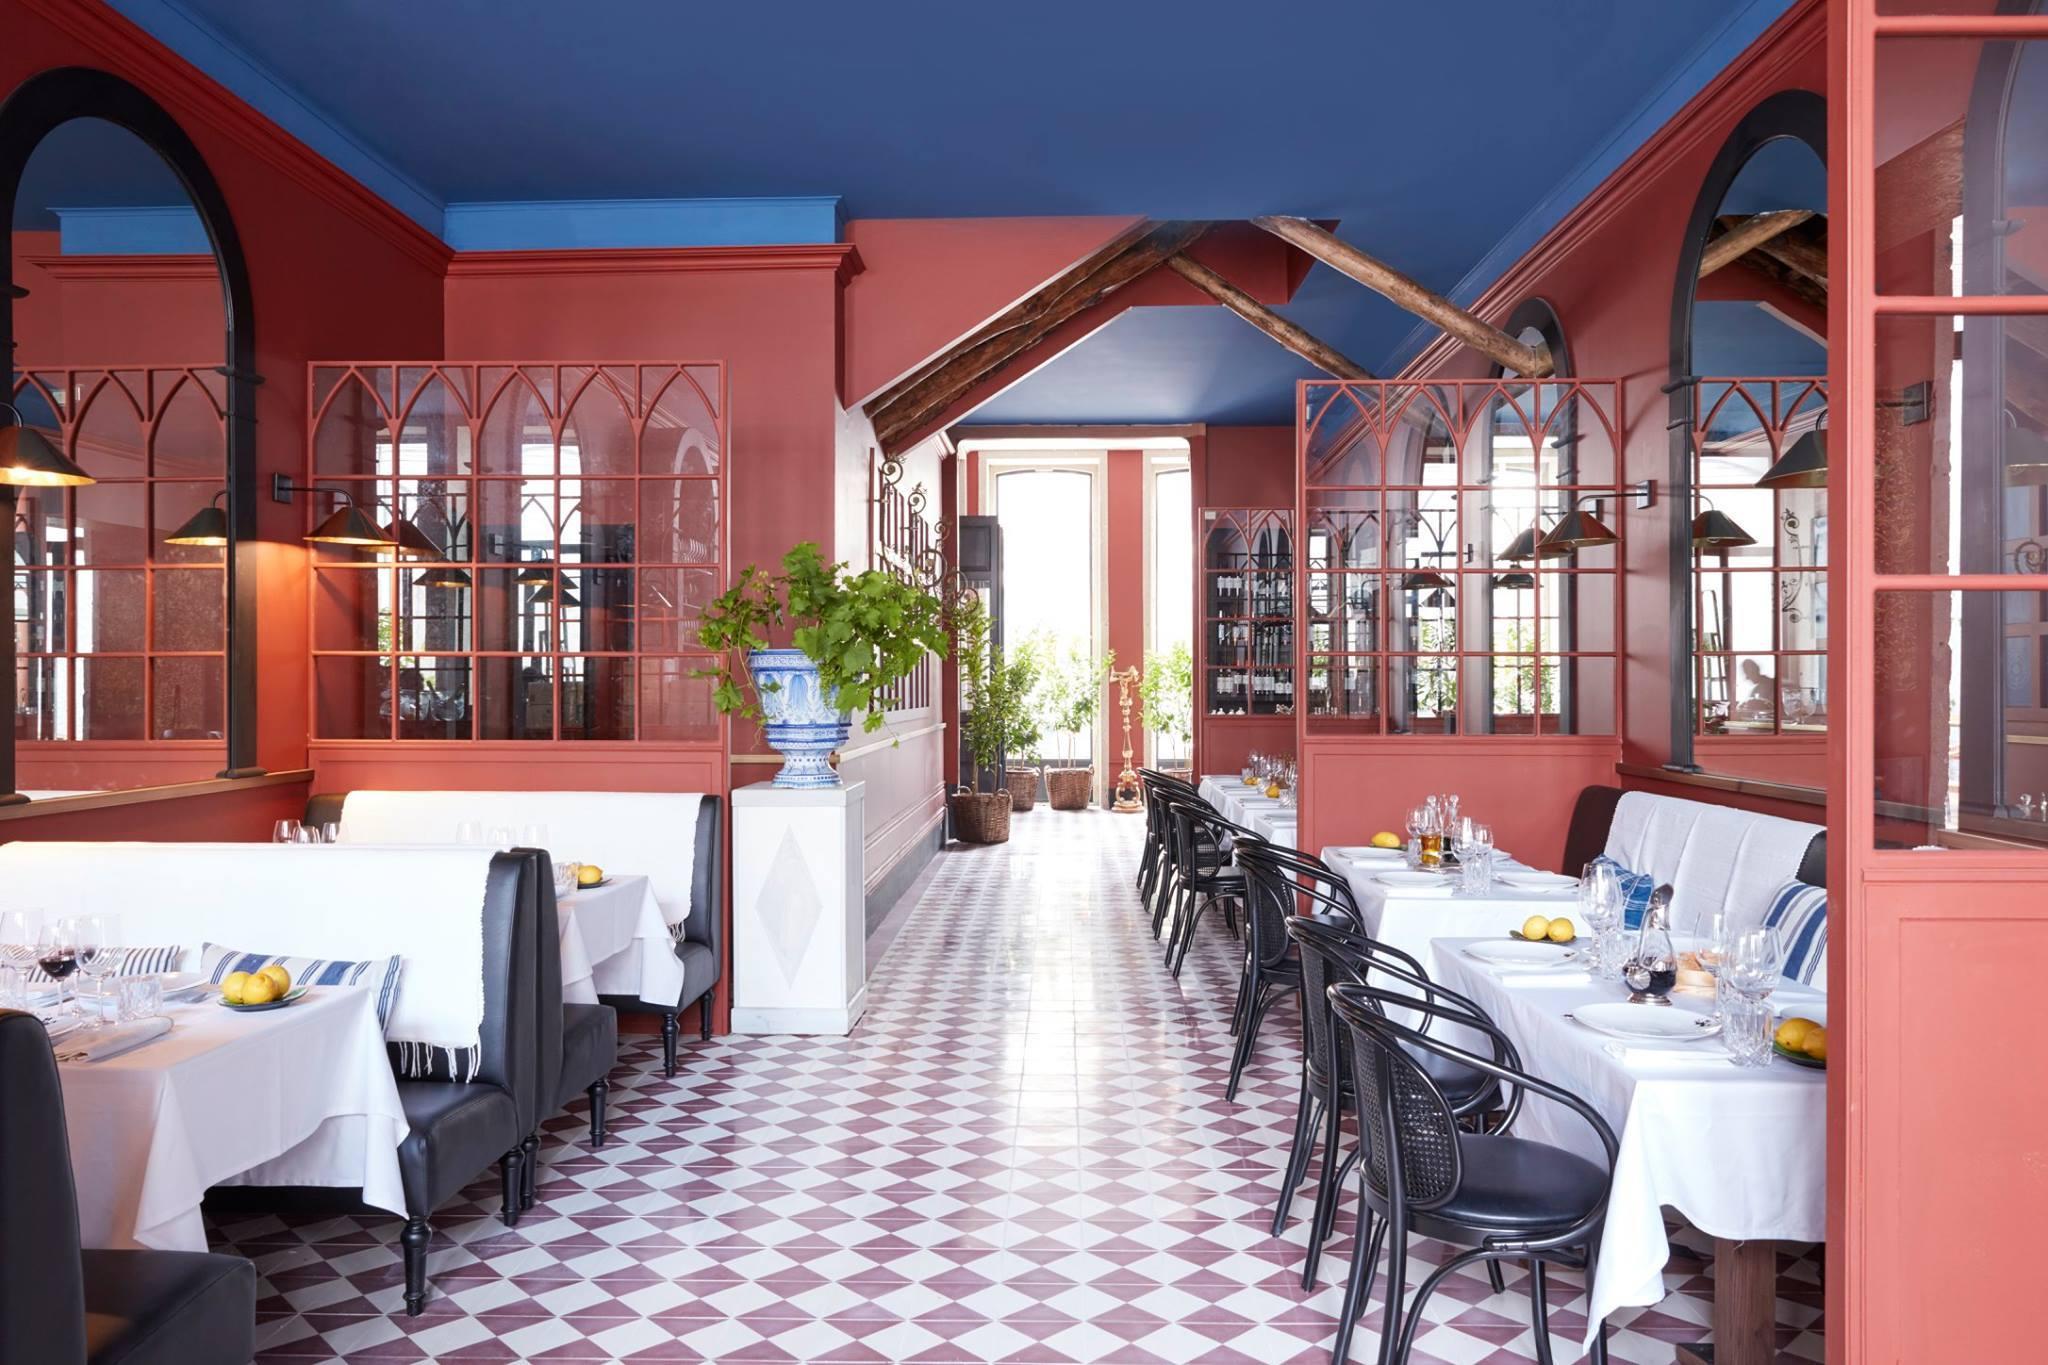 Cocorico Restaurante & Bar